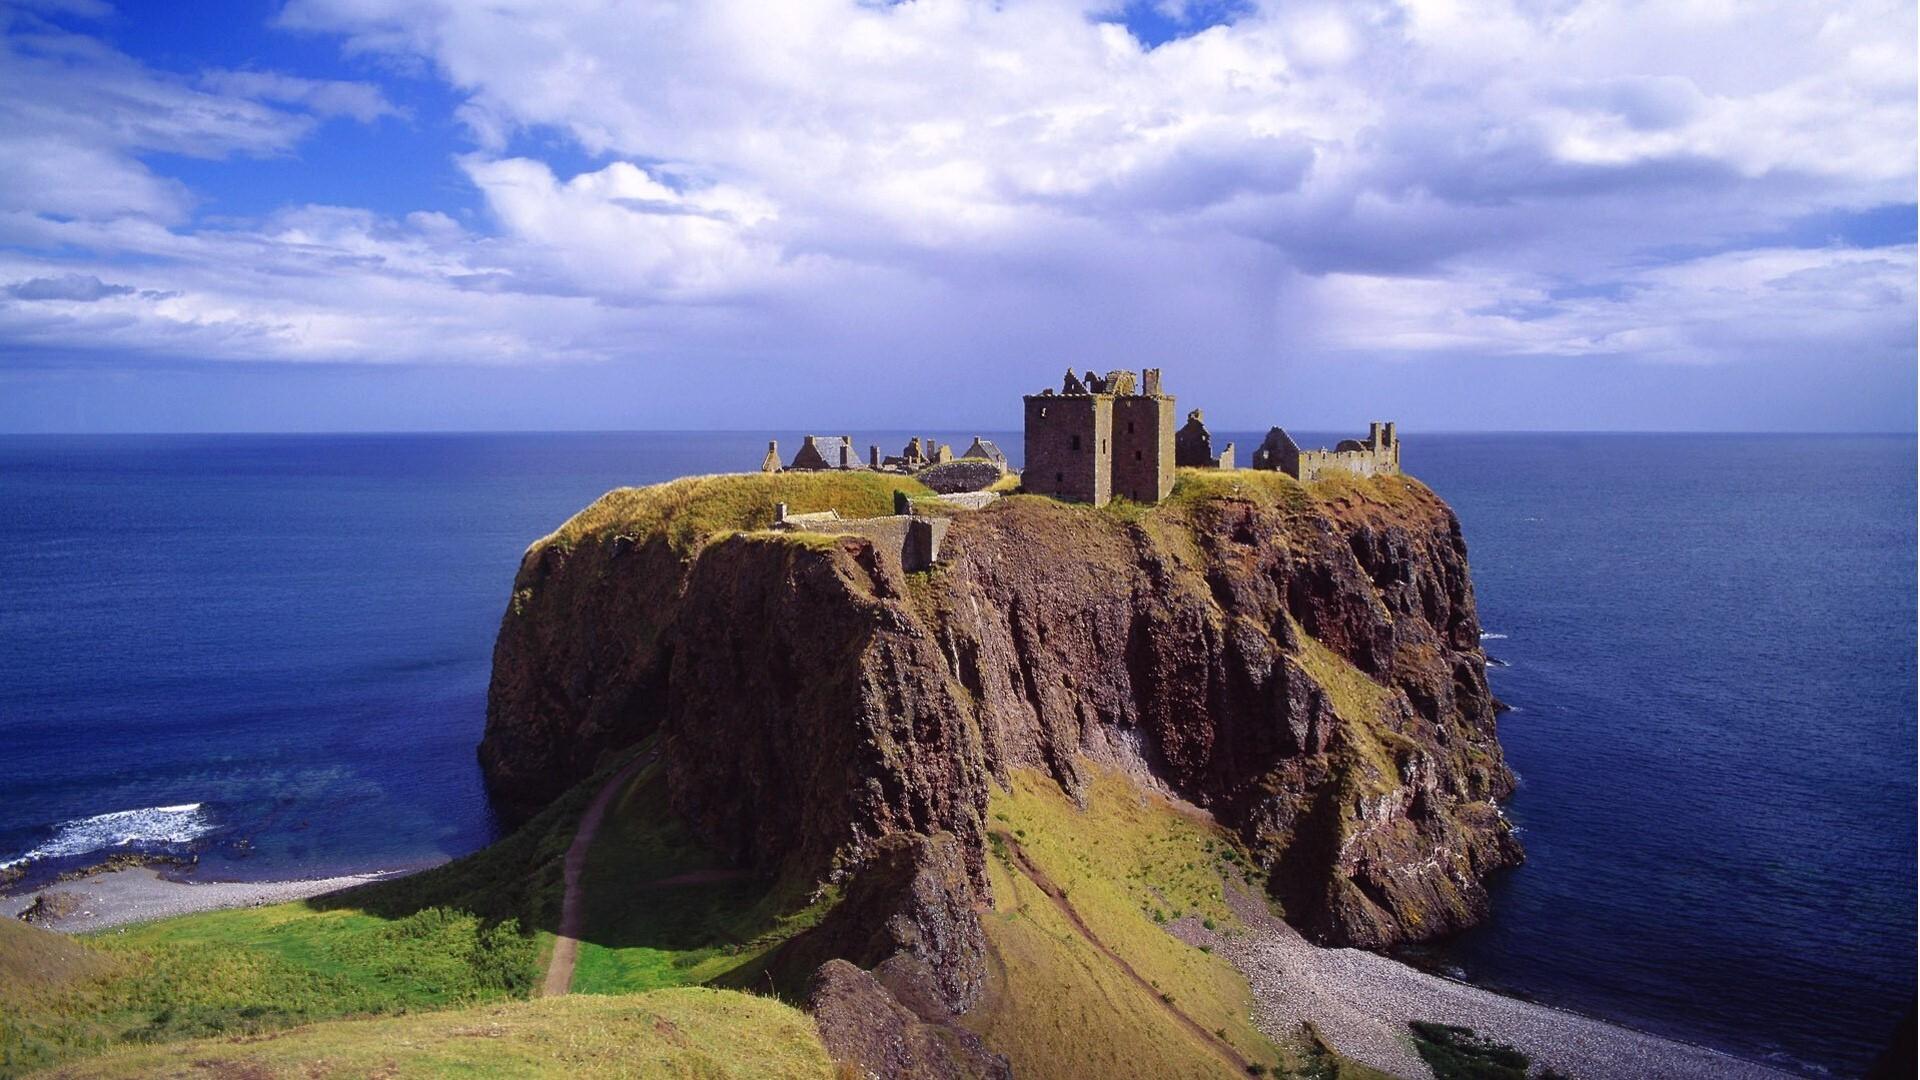 Beautiful dunnottar castle in scotland image hd wallpapers - Scotland wallpaper ...